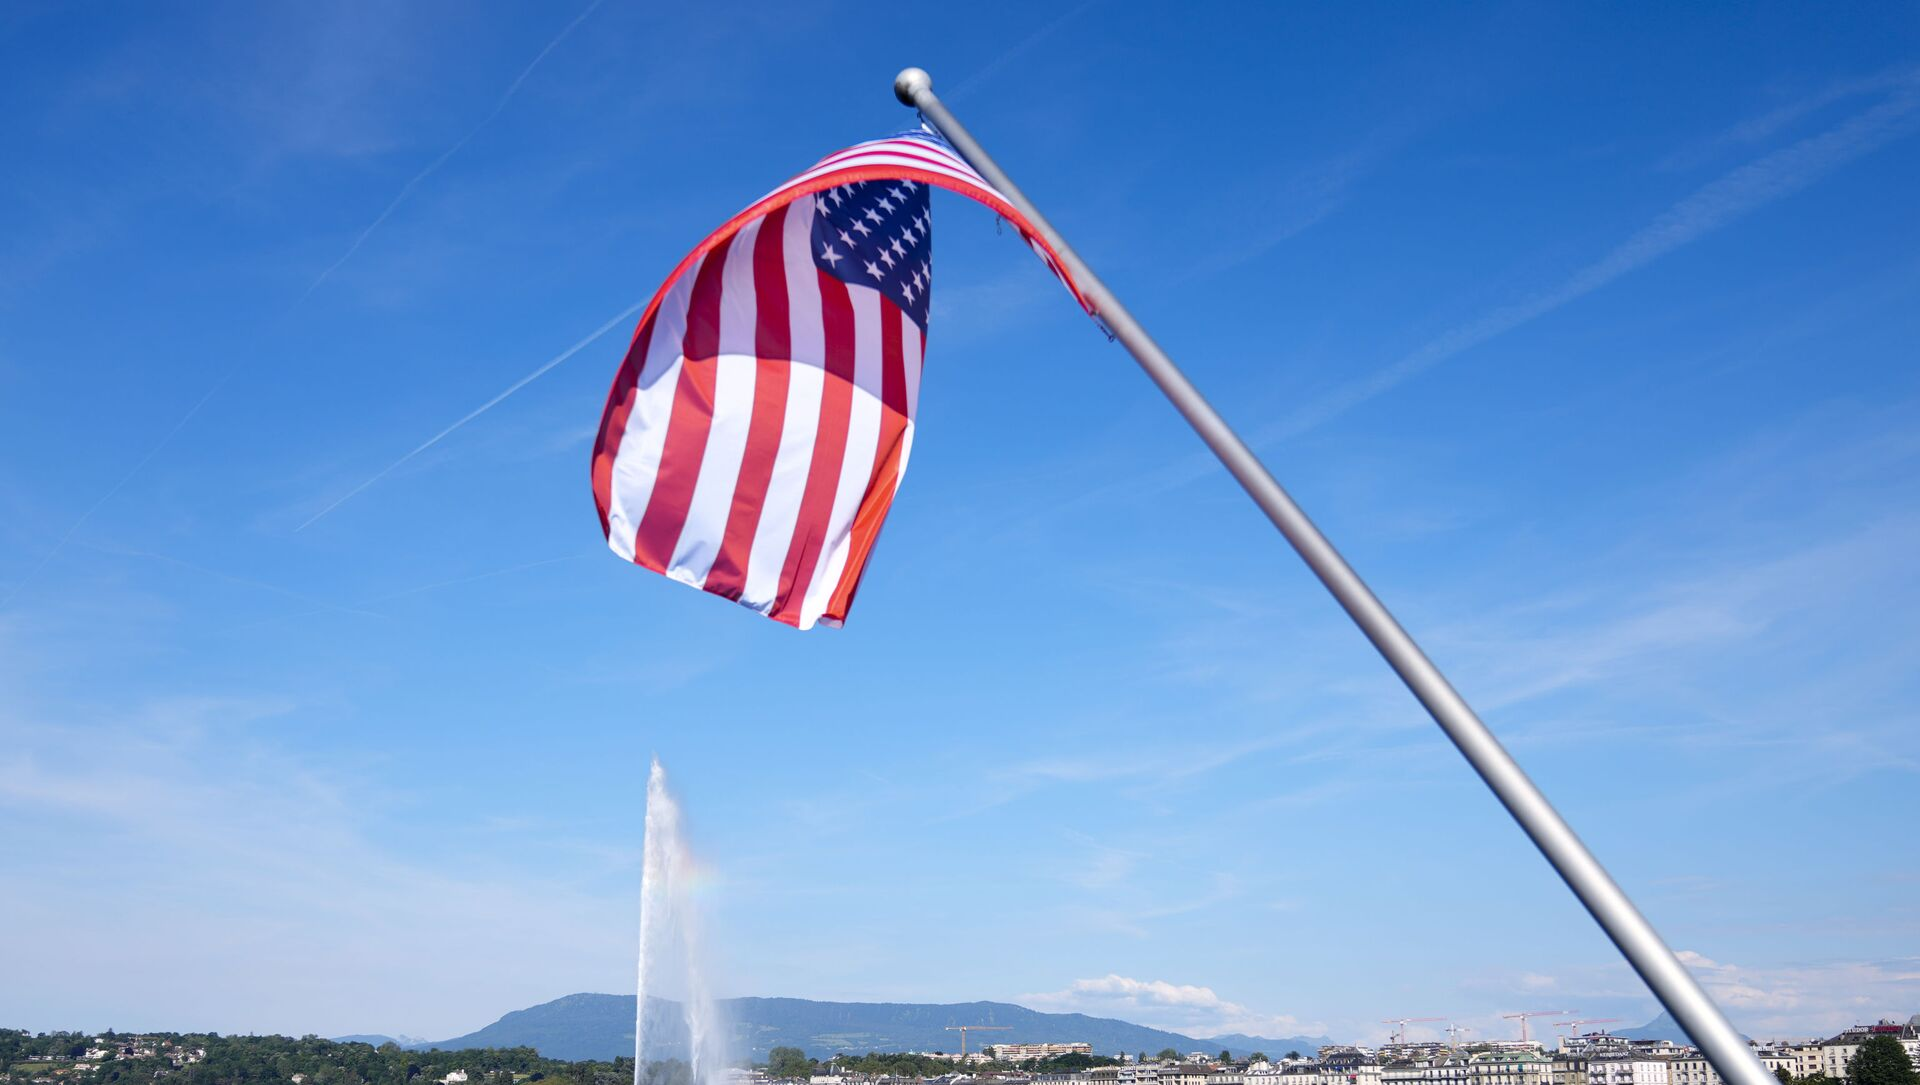 Флаг США, фото из архива - Sputnik Азербайджан, 1920, 06.08.2021